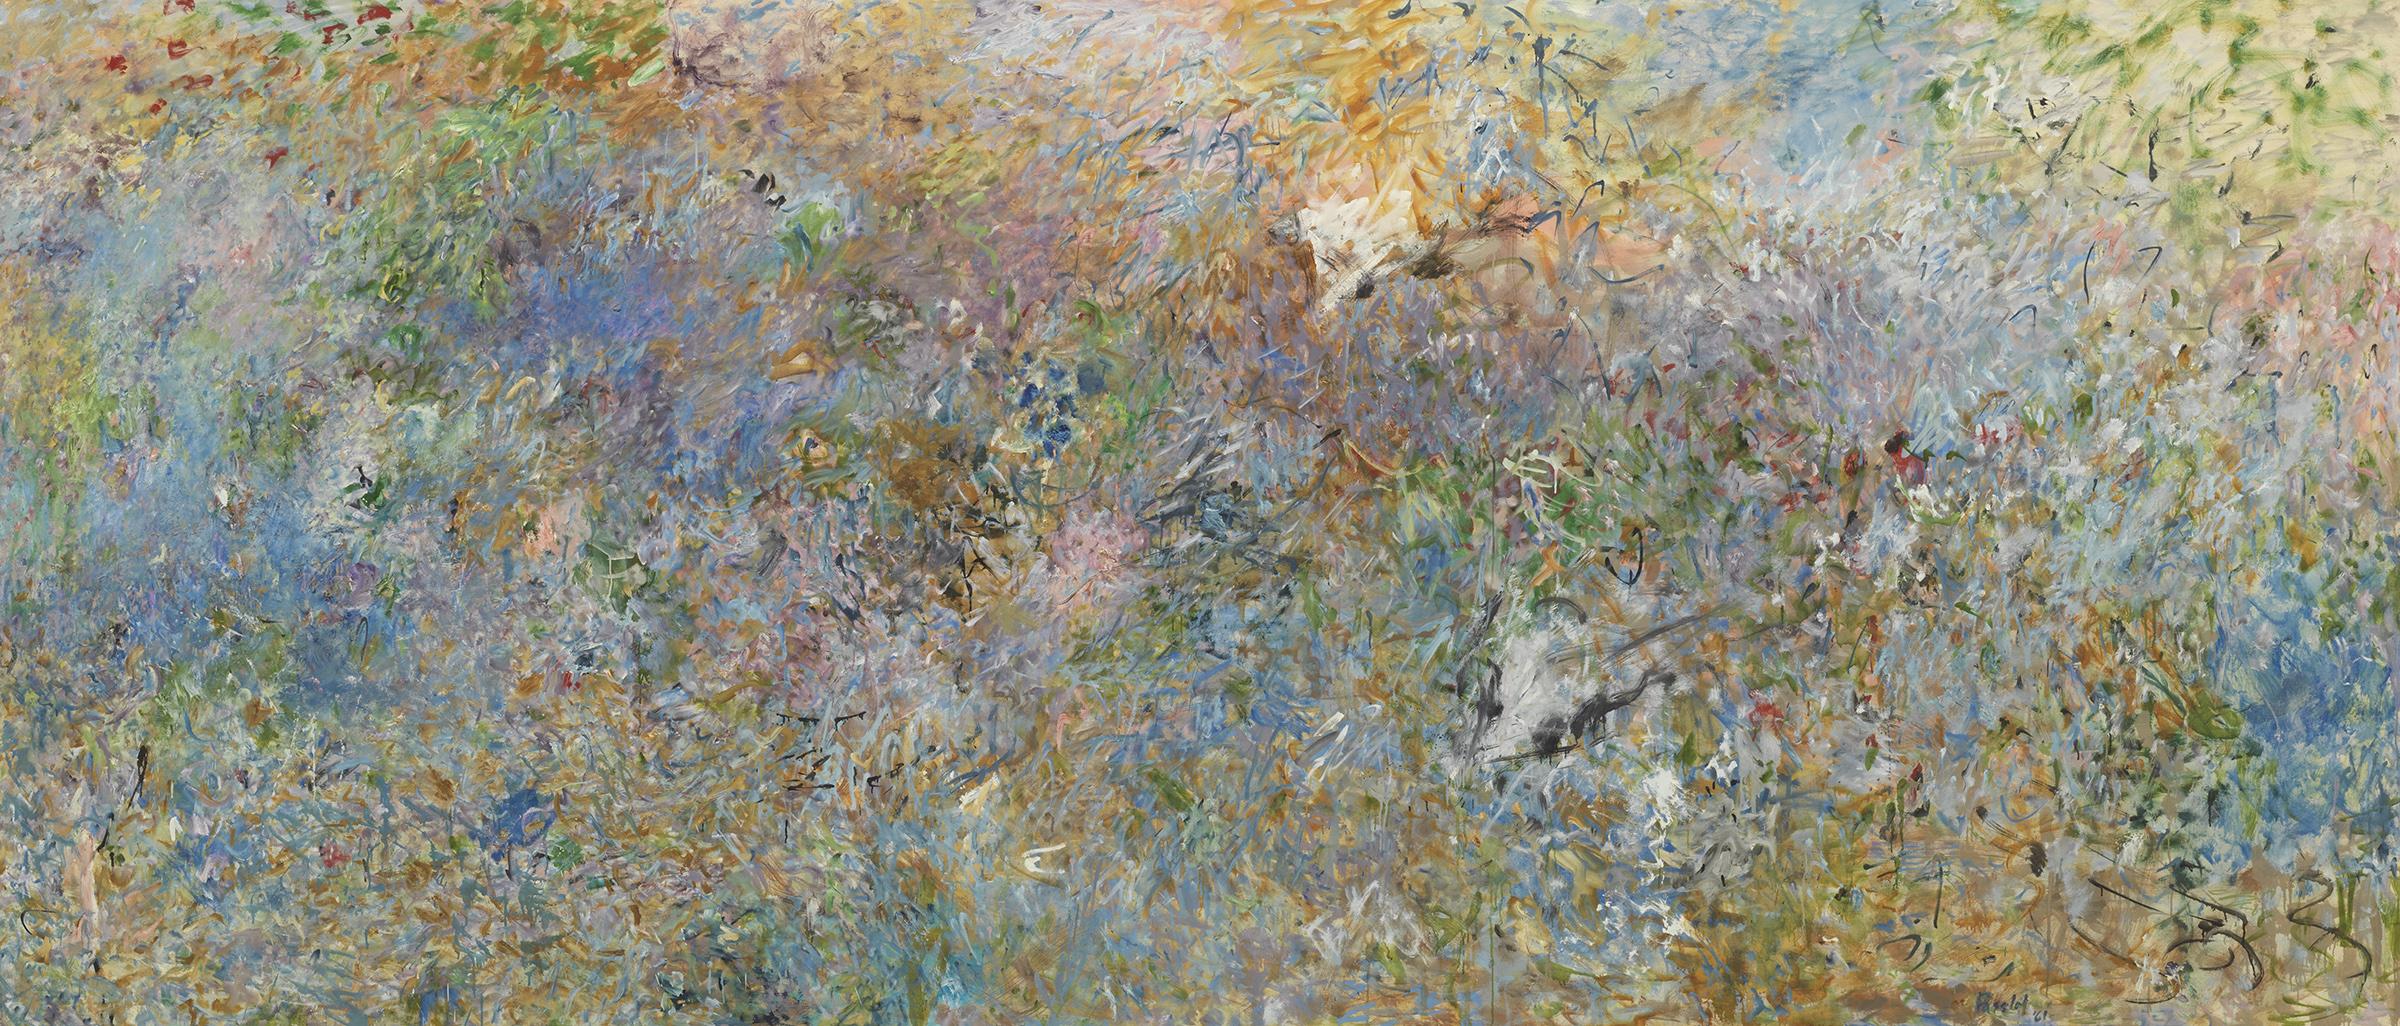 Pat Passlof  Sky Pasture , 1961 Oil on linen 68 x 144 inches